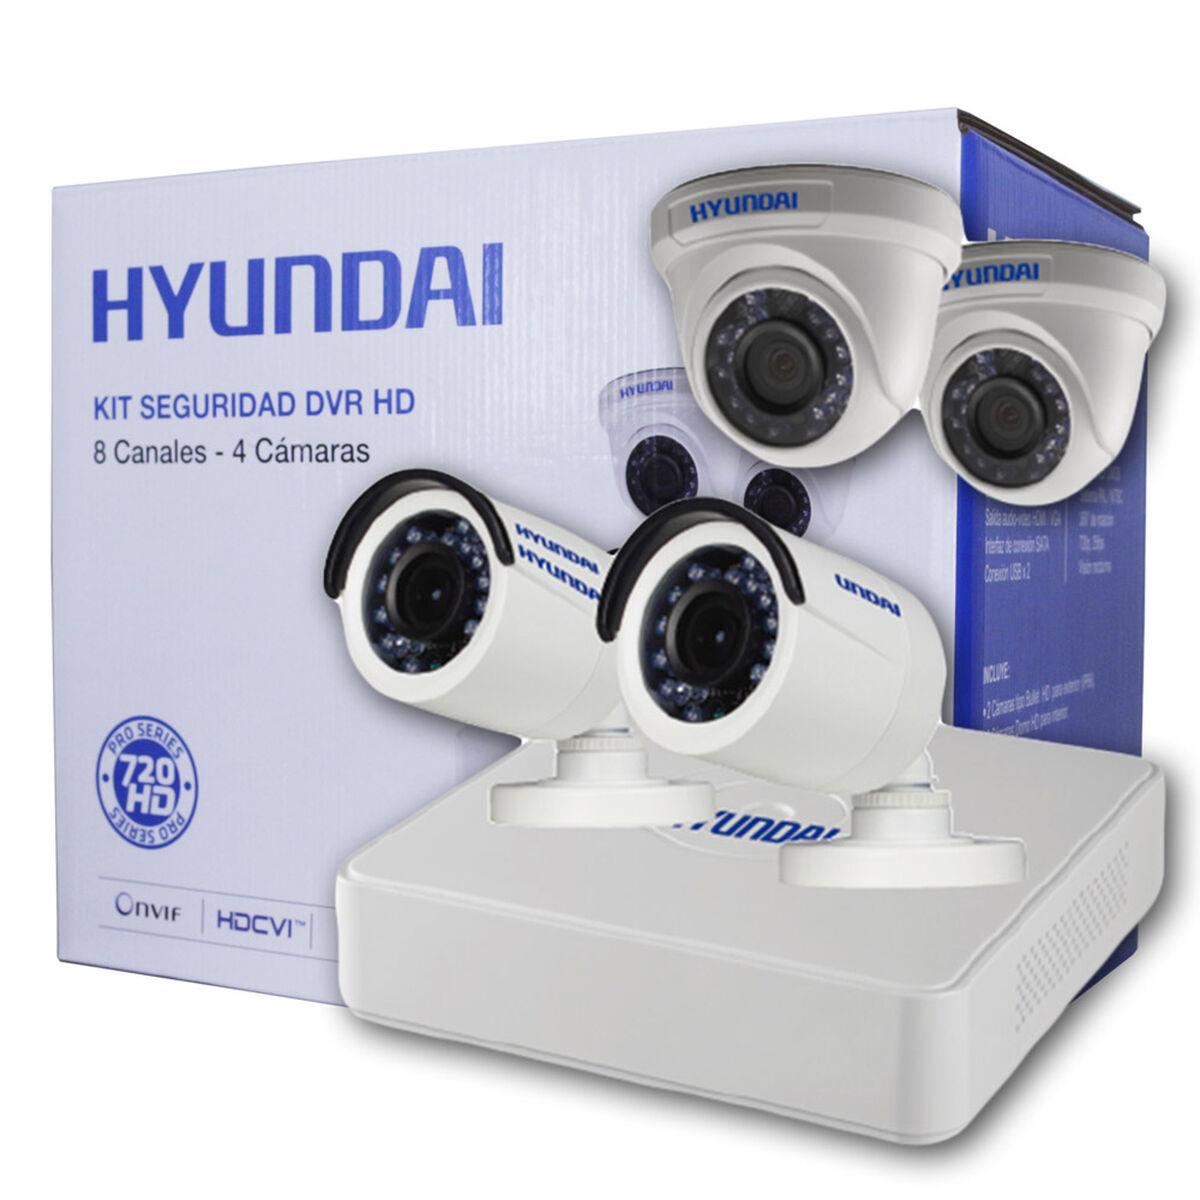 Kit 4 Cámaras de Seguridad Hyundai HY-DVR8CH DVR HD